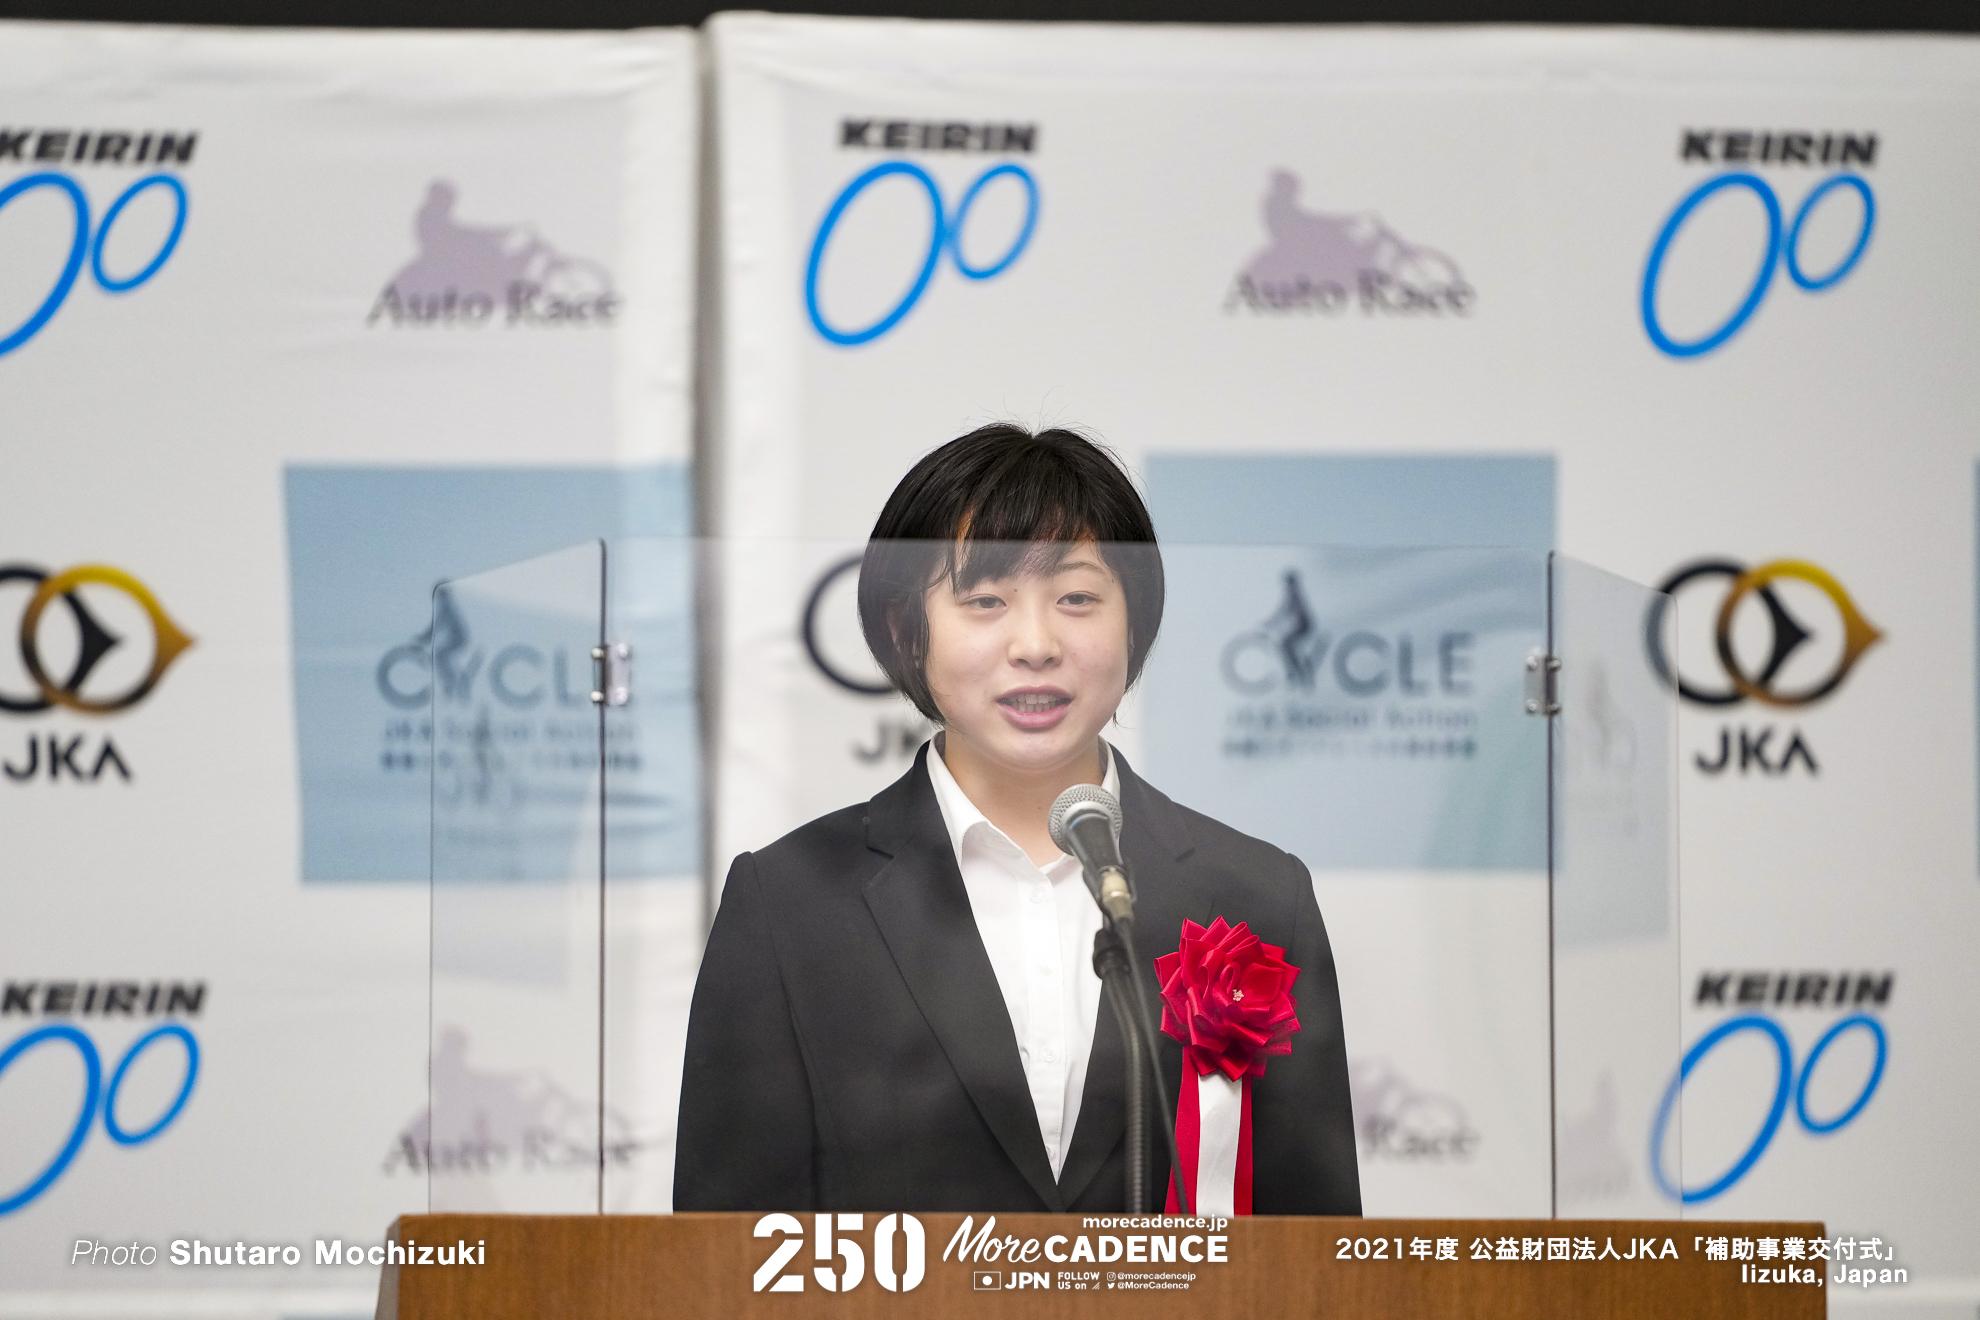 2021年度JKA補助事業交付式・飯塚オートレース場